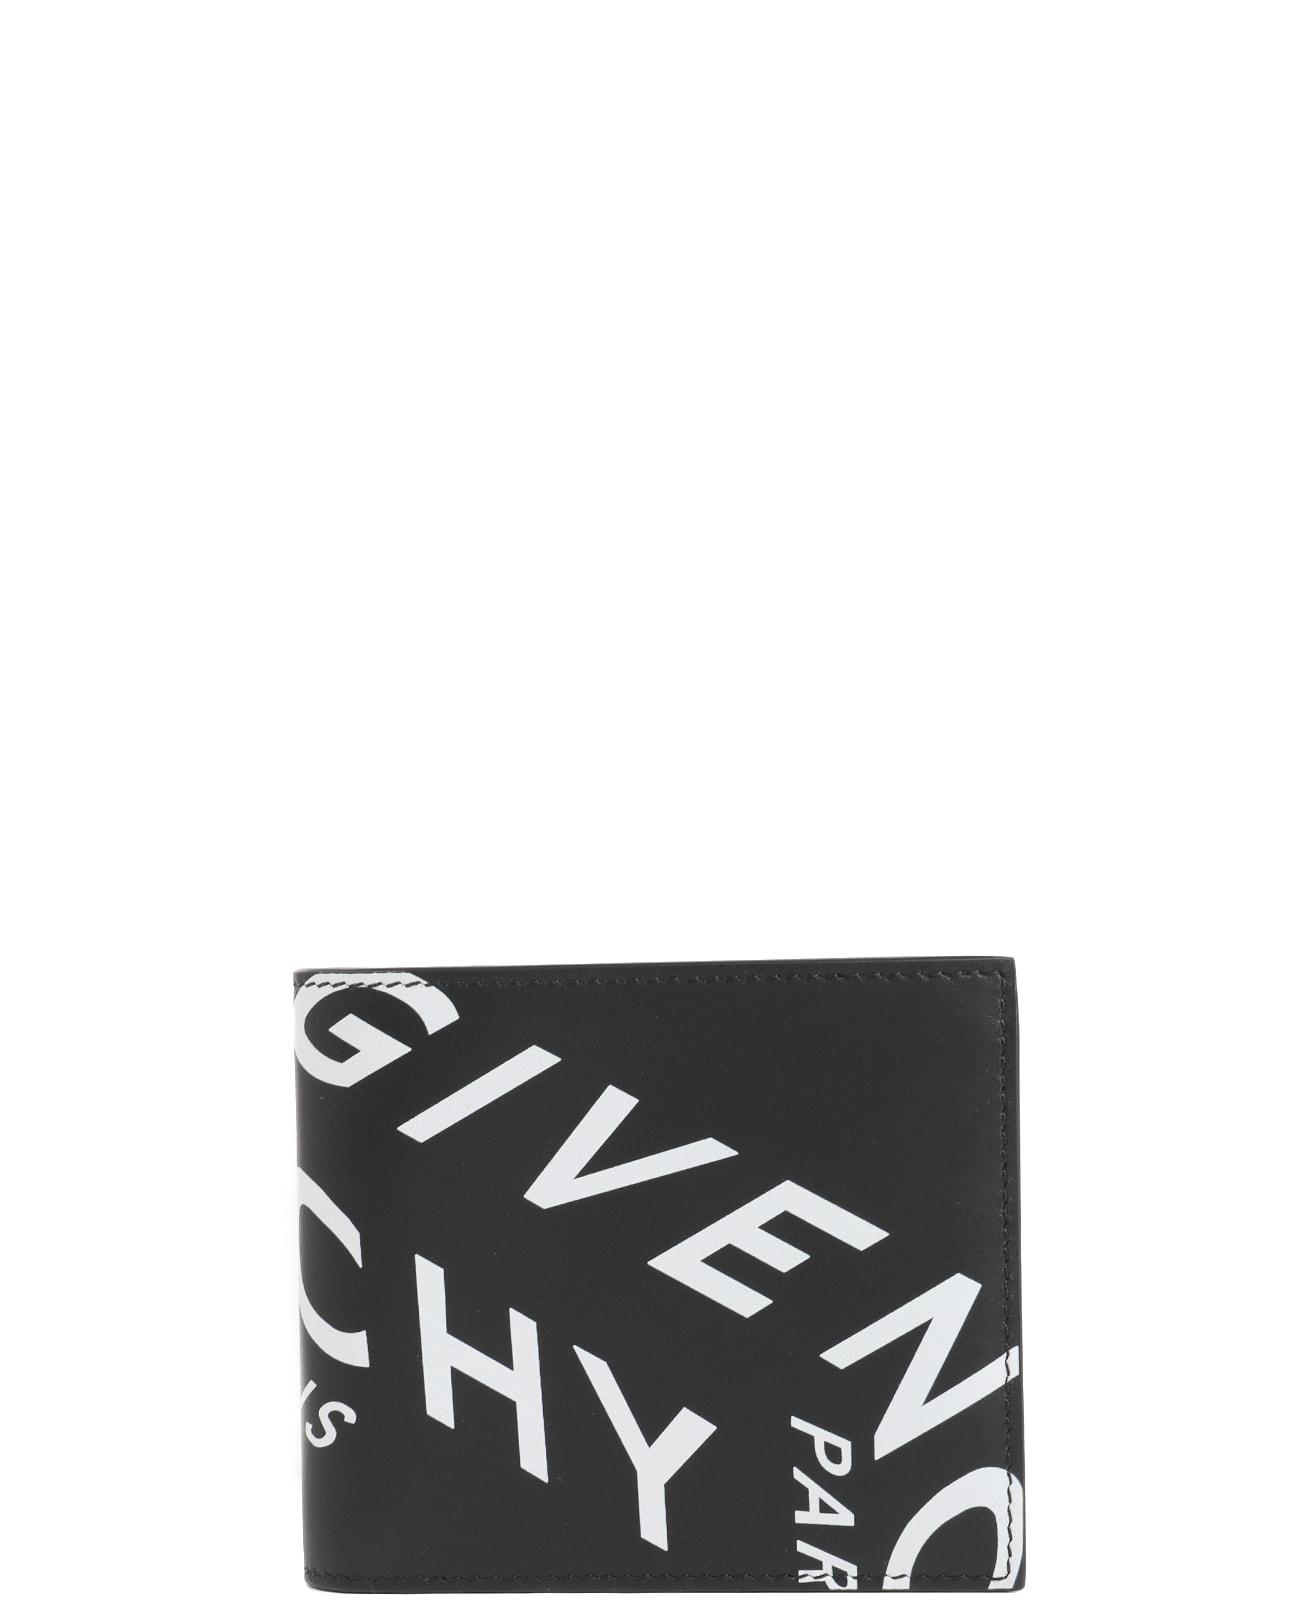 Givenchy Black Billfold Wallet